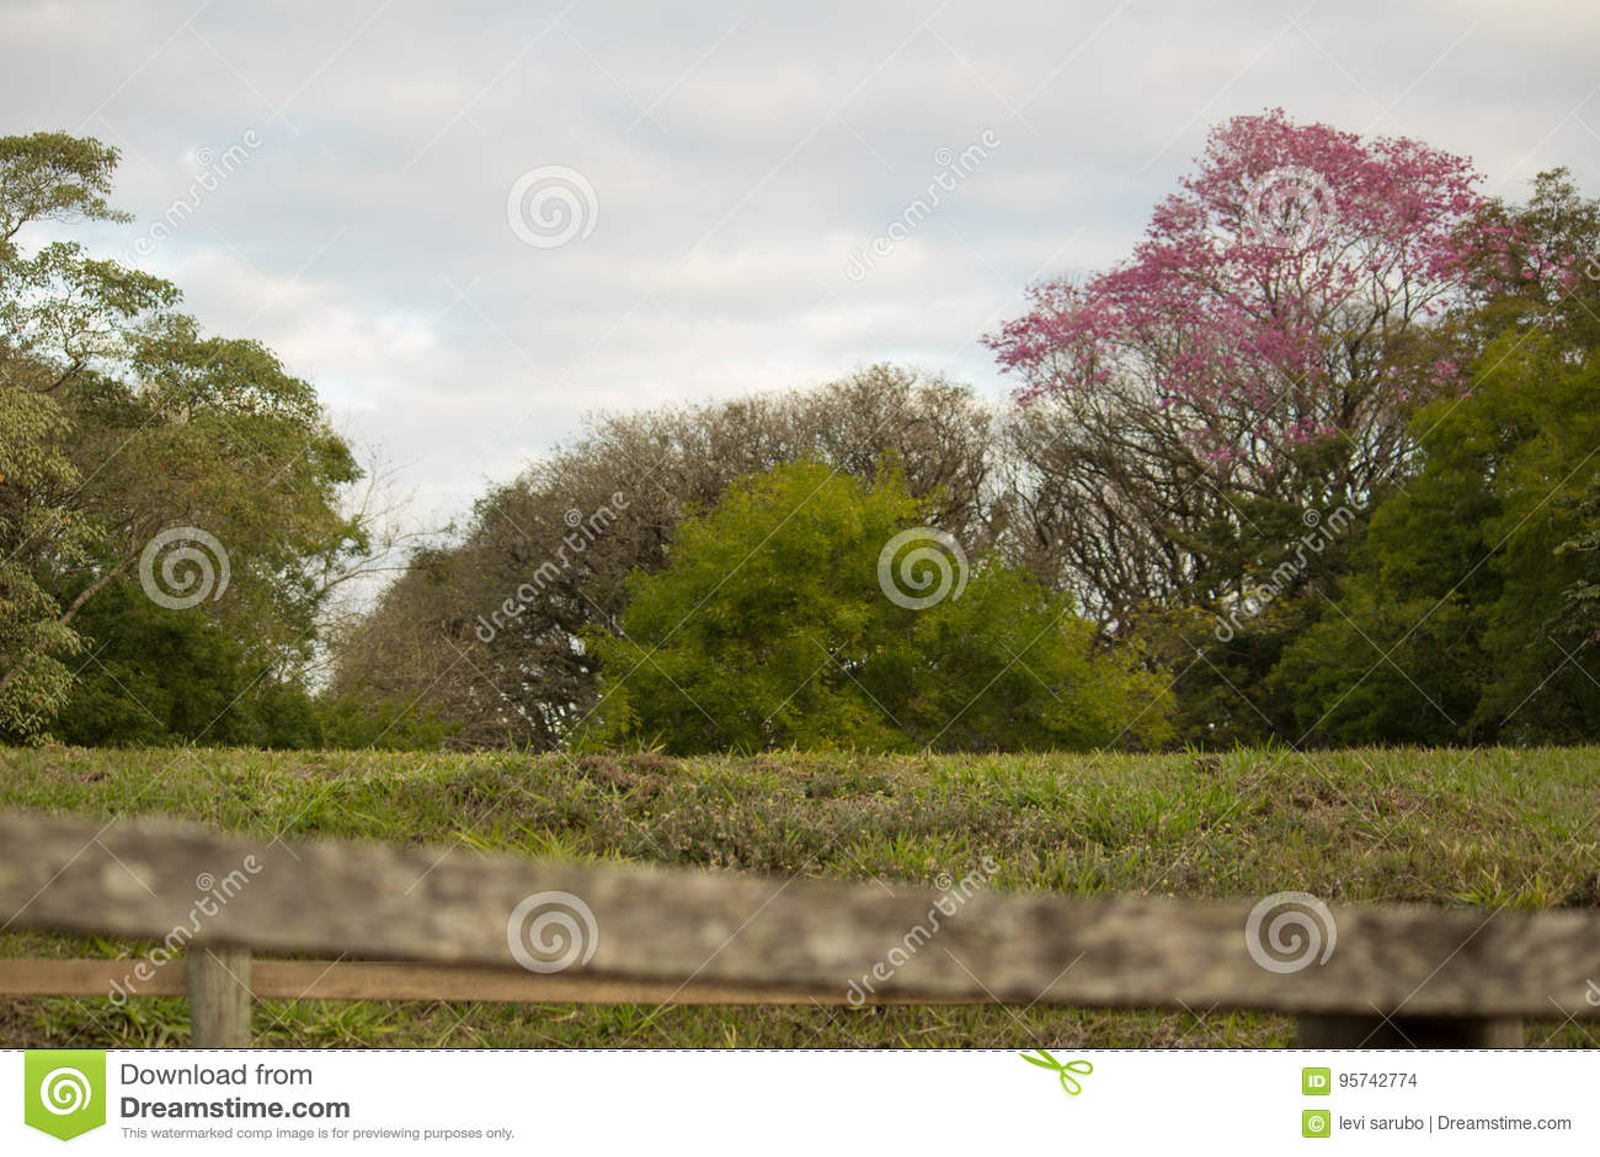 Flowery δέντρο με τα ζωηρόχρωμα λουλούδια